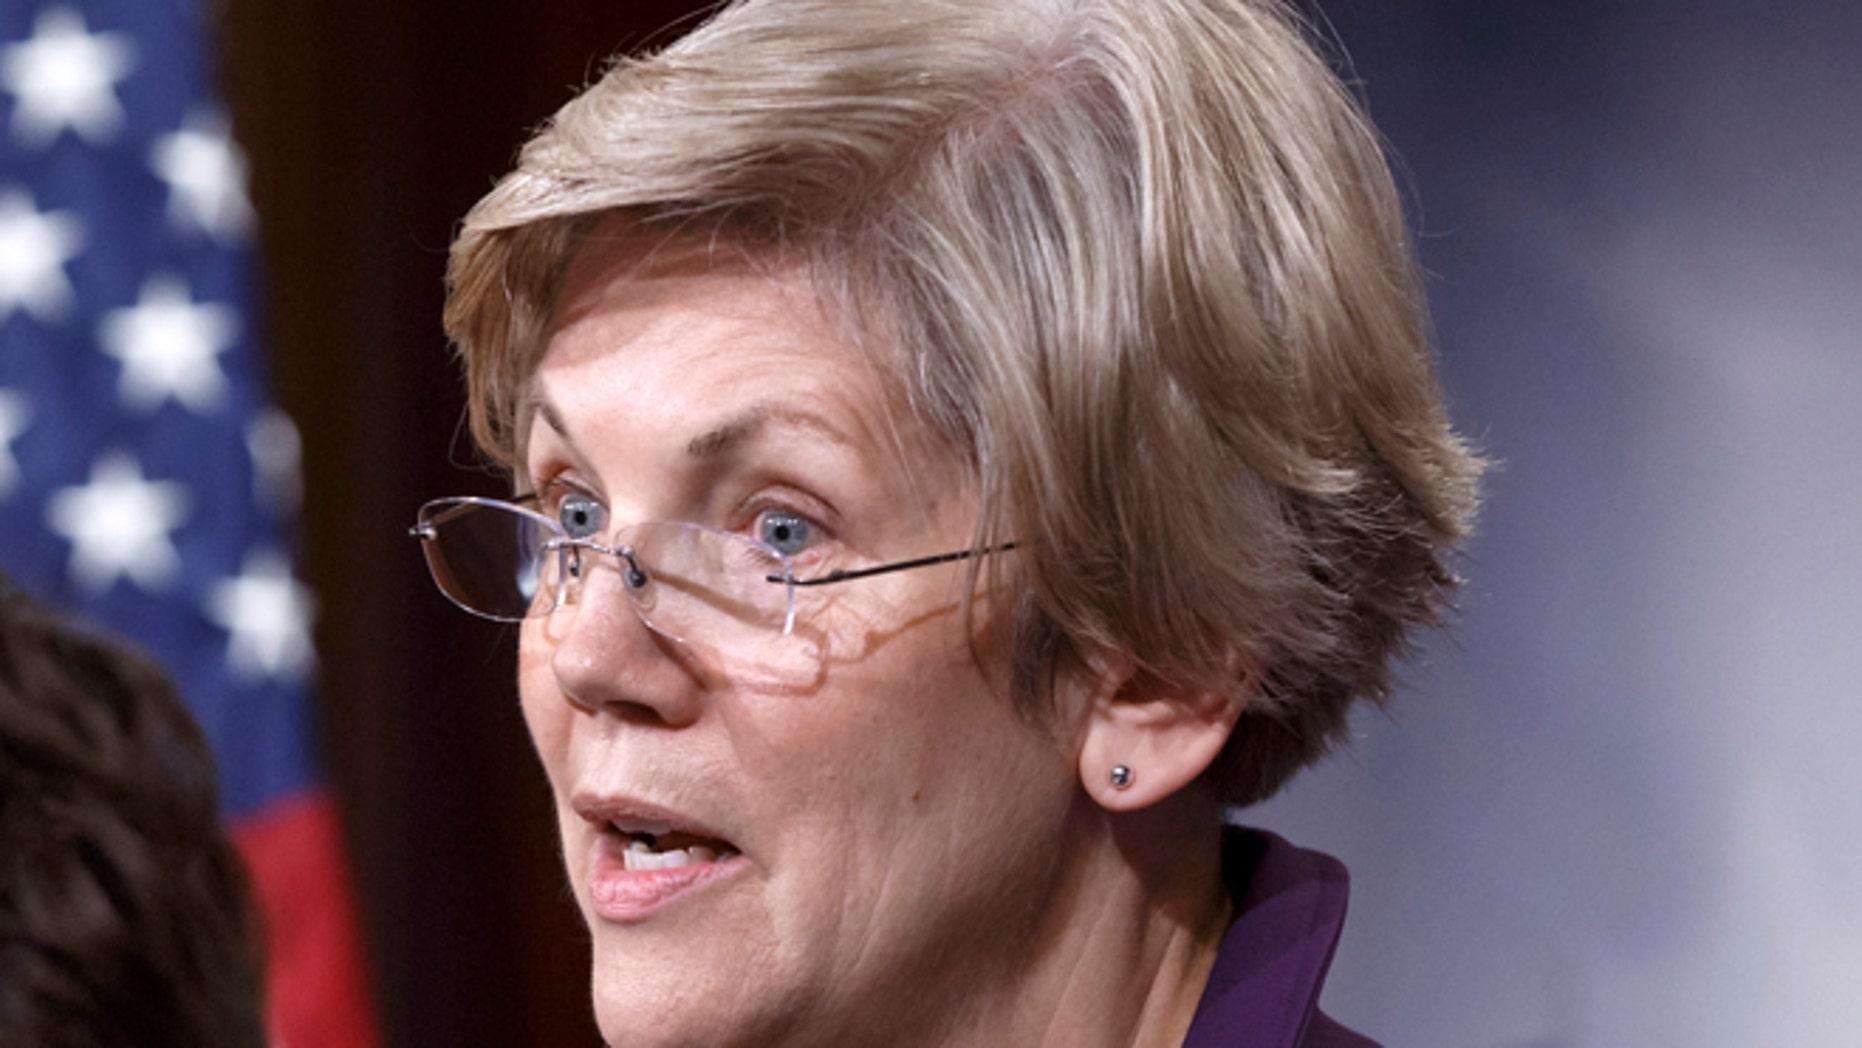 In this Dec. 10, 2014 file photo, Sen. Elizabeth Warren, D-Mass., speaks on Capitol Hill in Washington.